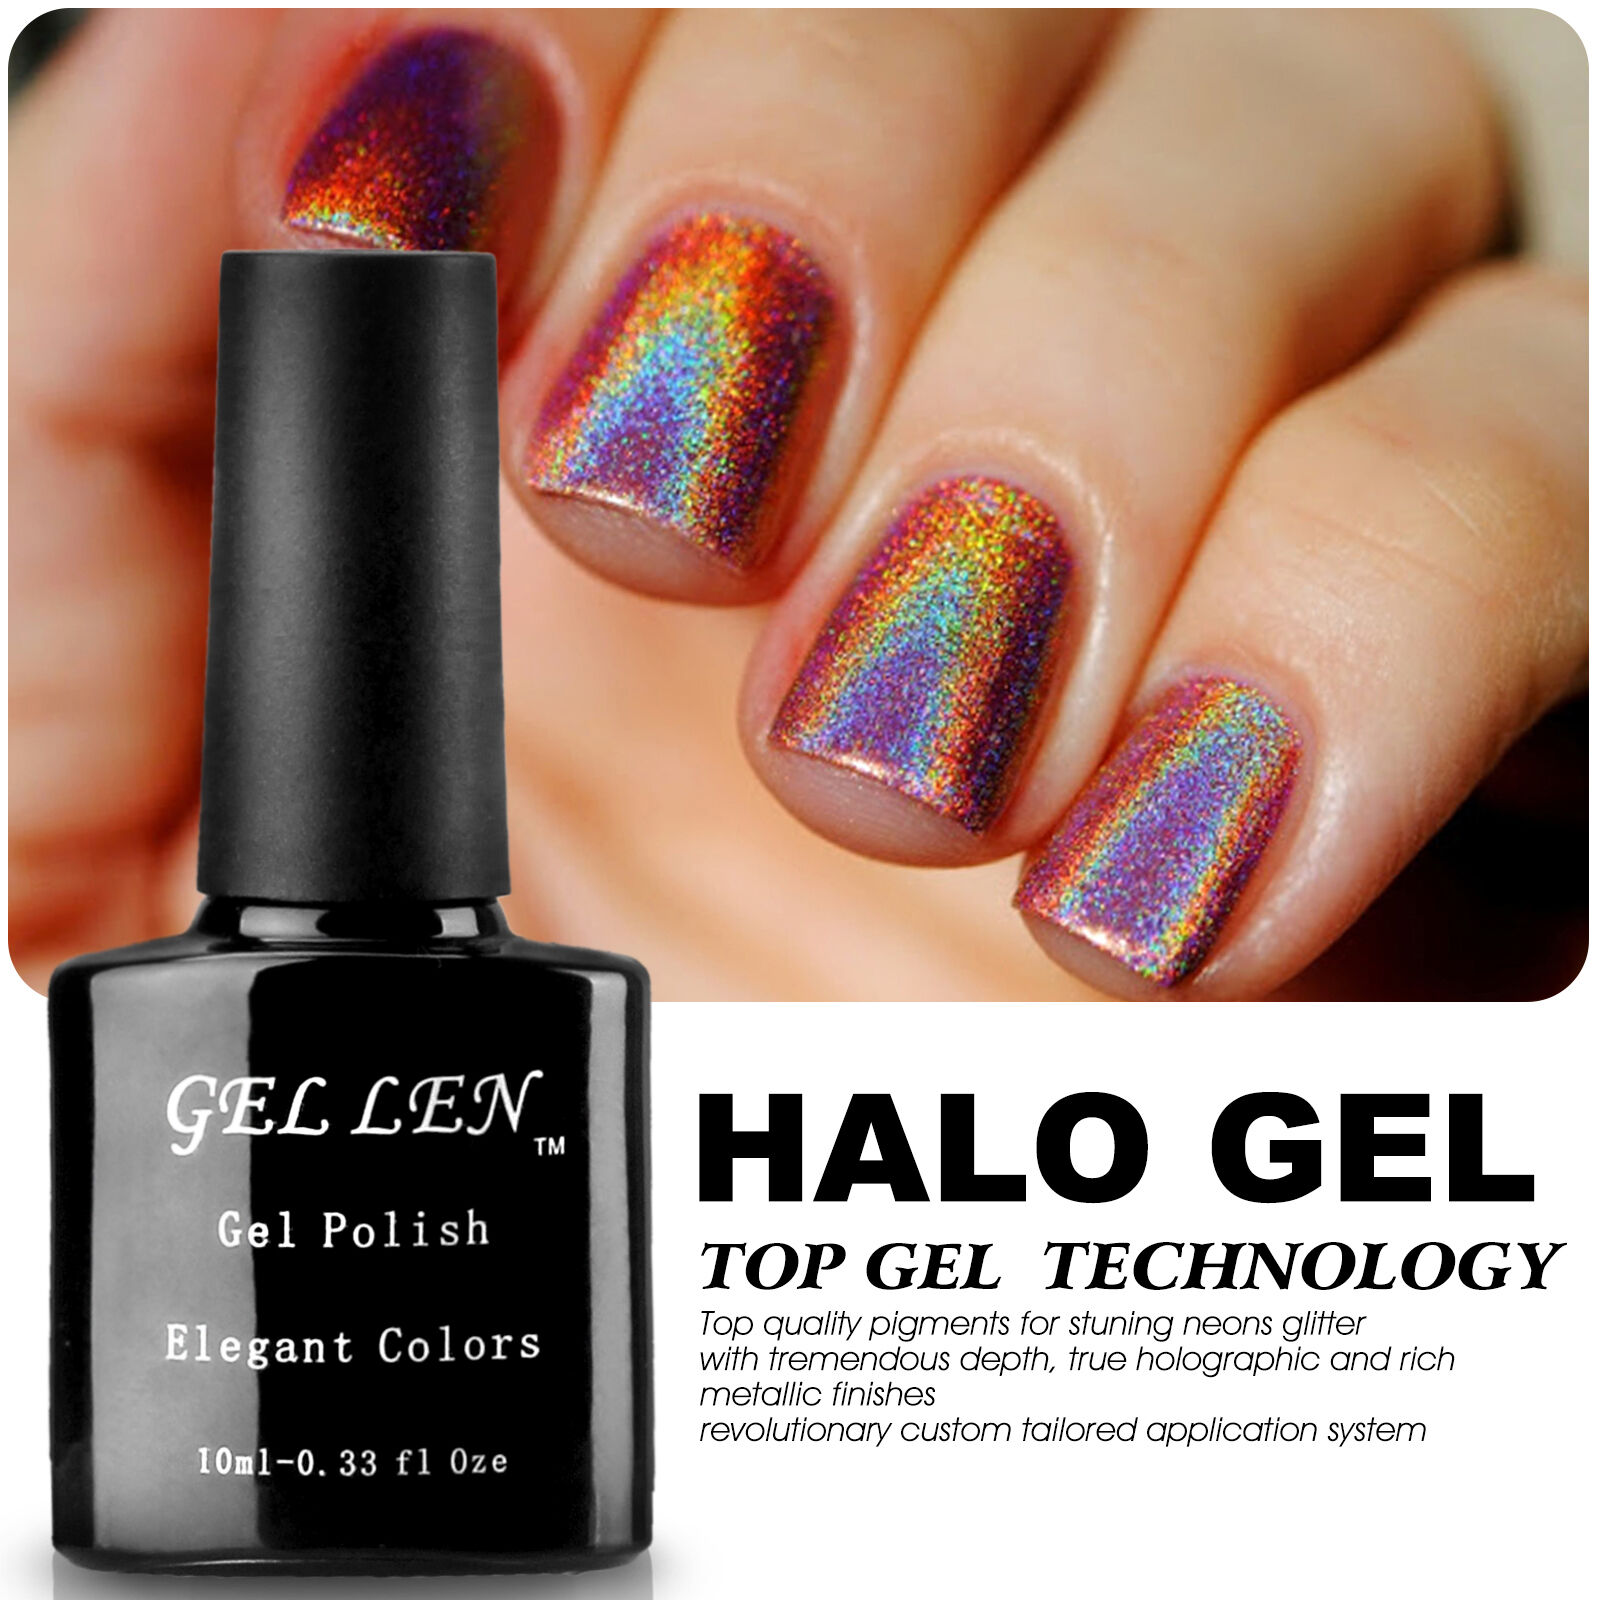 Color Changing Gel Nail Polish: Gellen Temperature Color Change Manicure UV Led Gel Polish